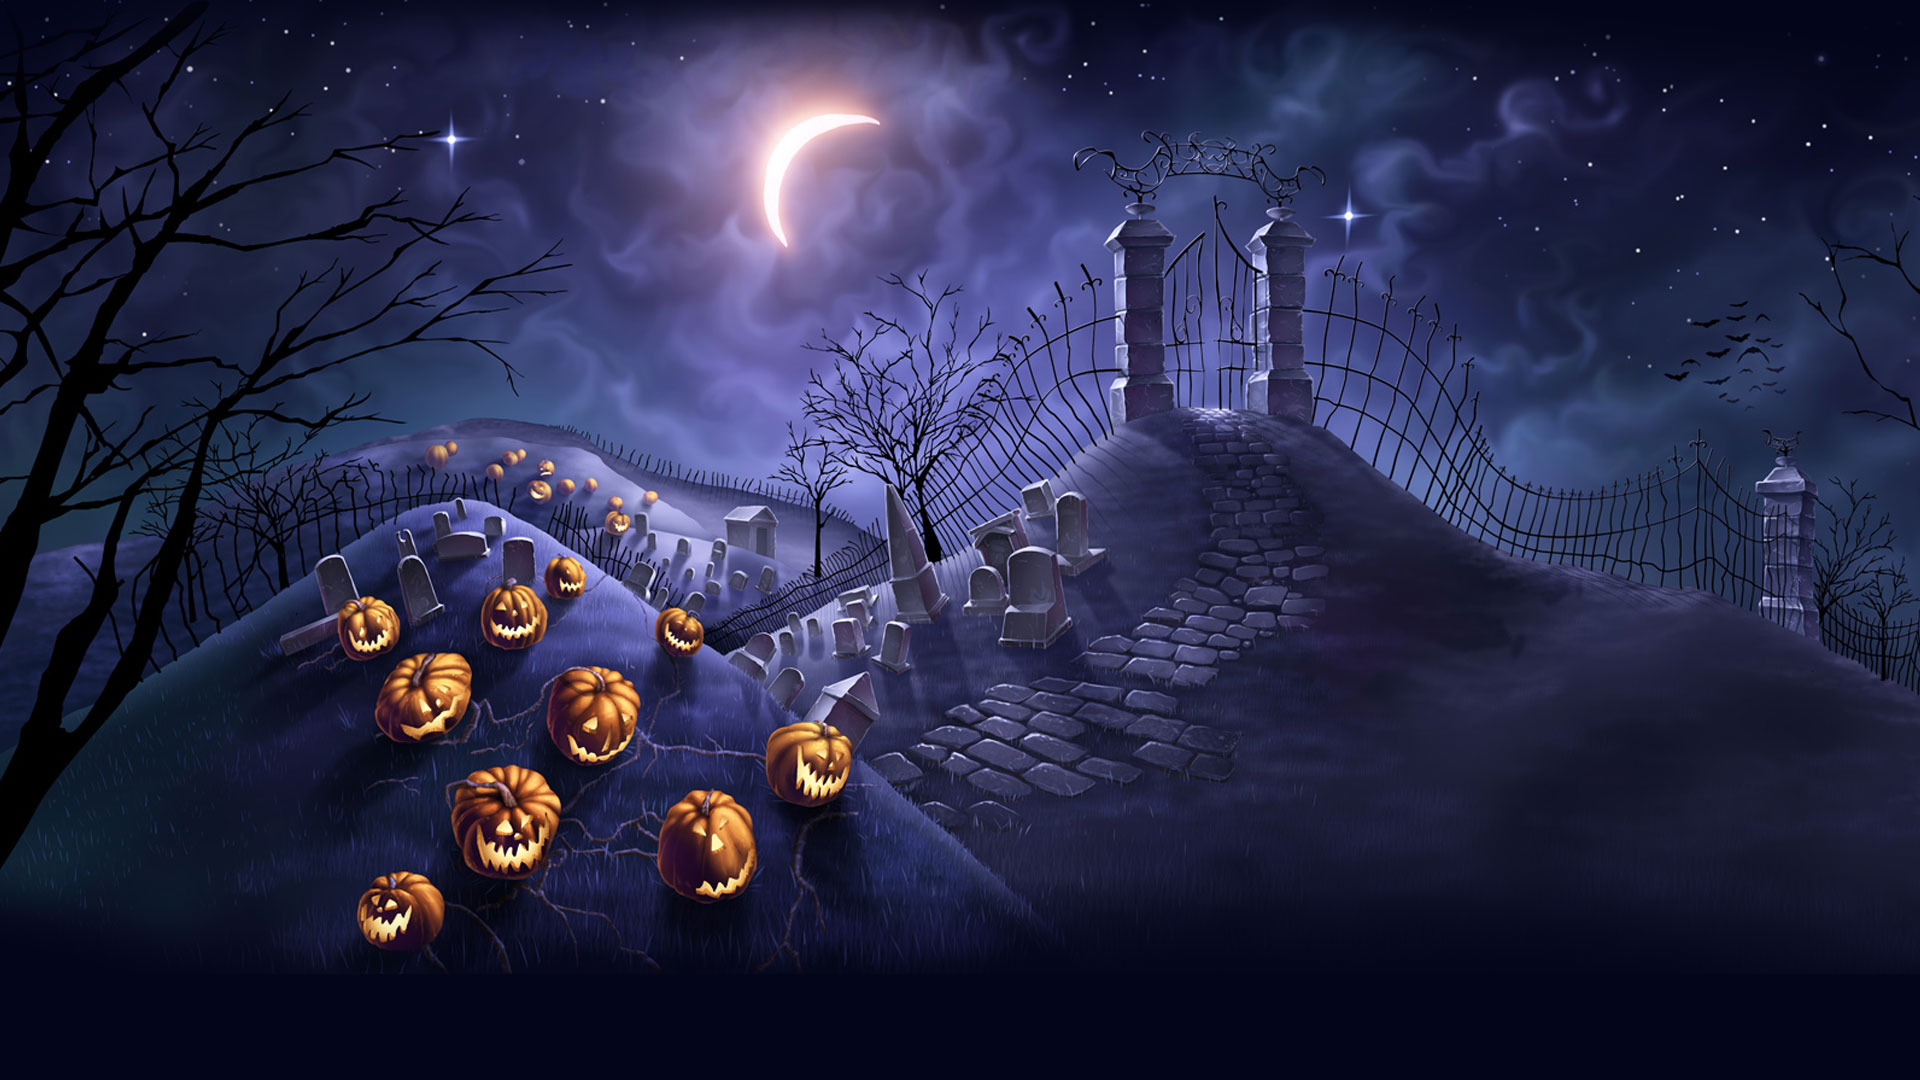 50 Scary Halloween 2019 Wallpapers HD Backgrounds Pumpkins 1920x1080